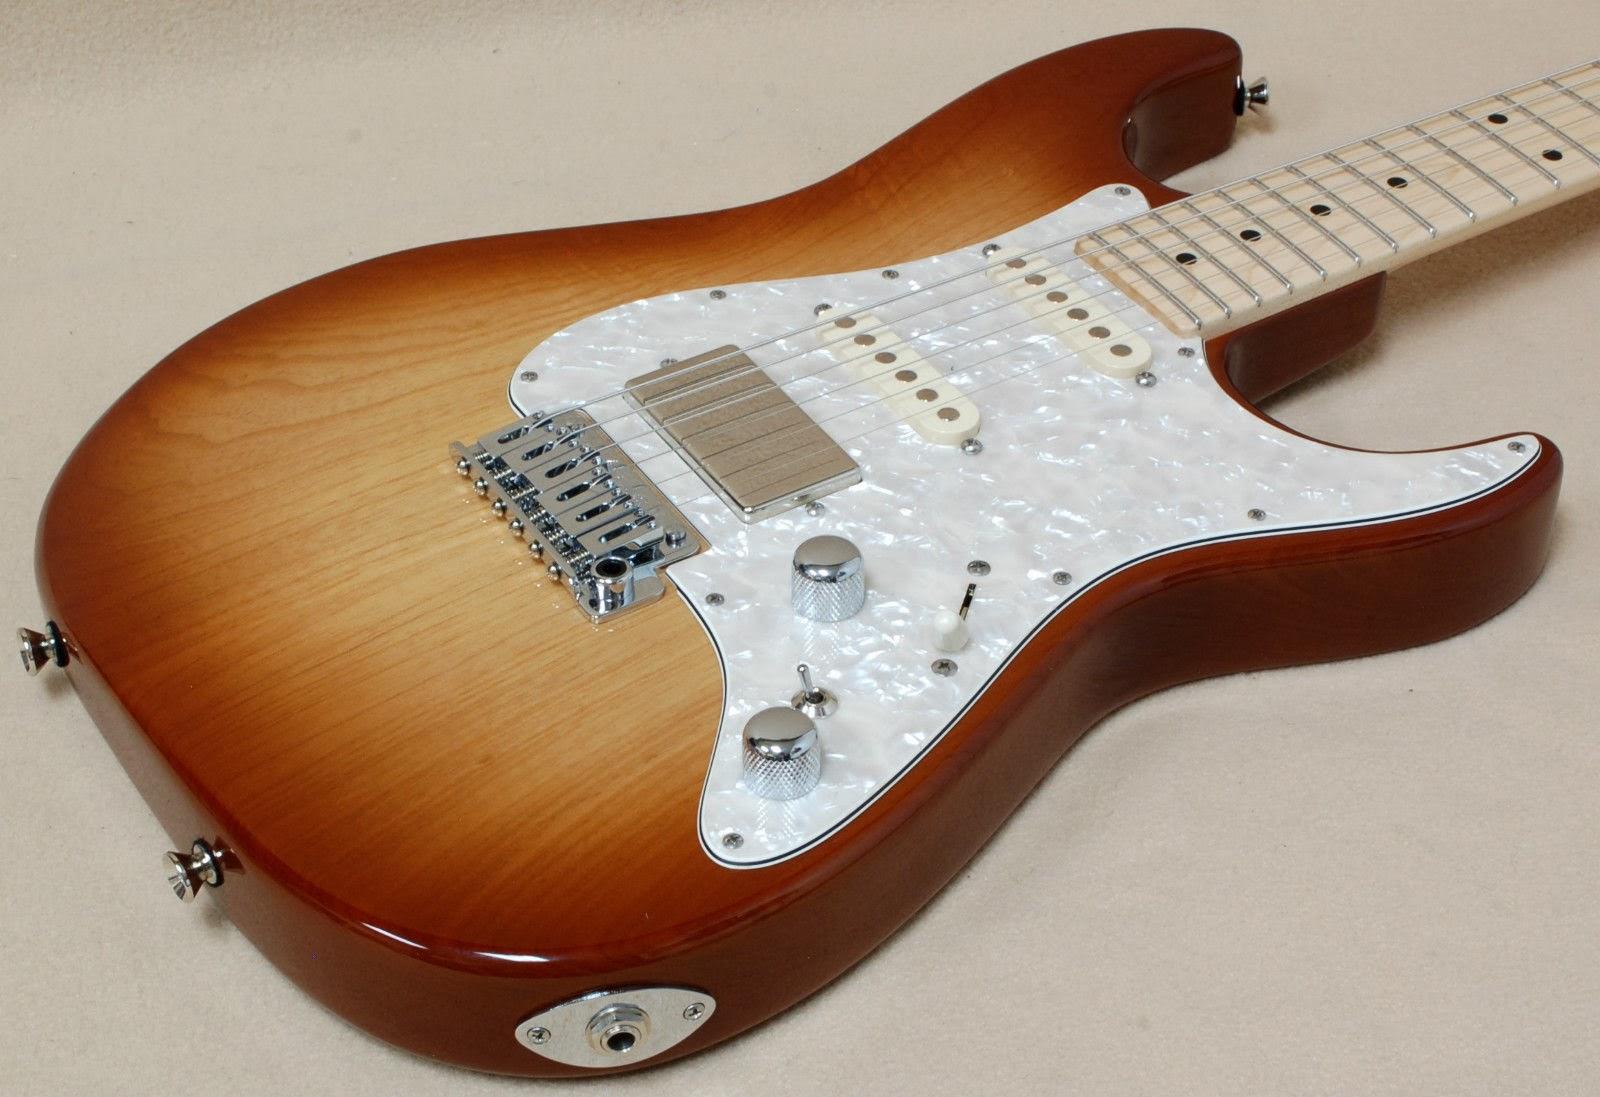 Tom Anderson Guitar Wiring Diagram Fender Schematics Classic Autumn Burst Friday Strat 326 Rh Stratoblogster Com Diagrams 3 Pickups